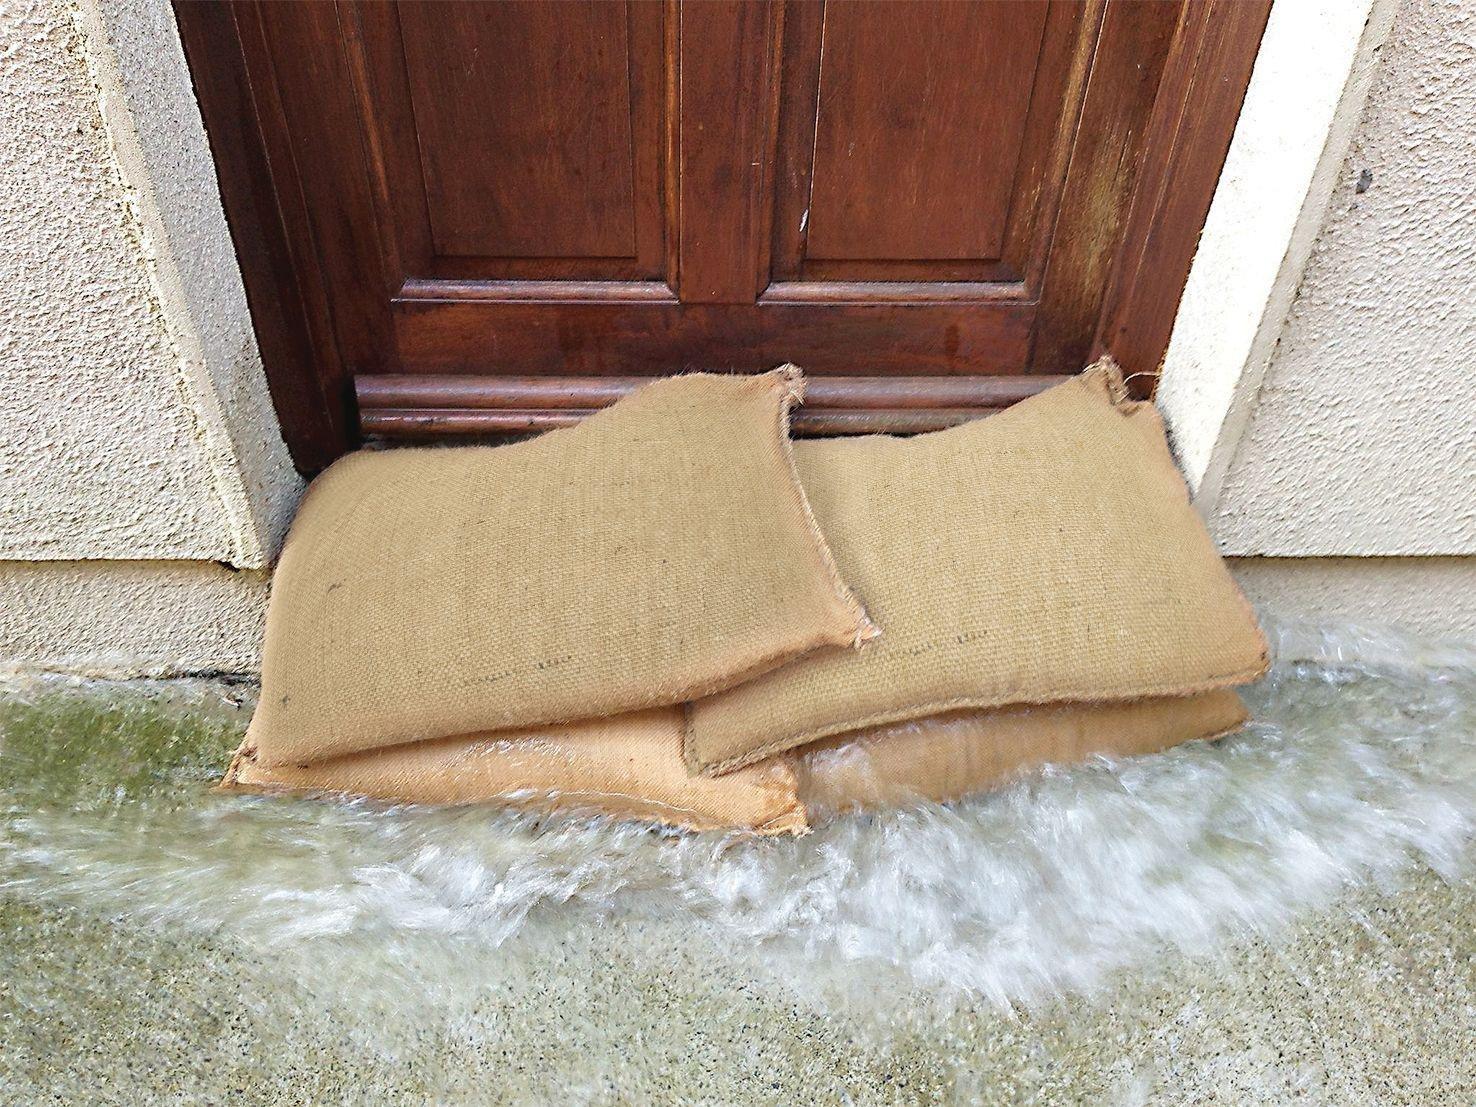 Image of AP Flood Alert Hessian Expanding Flood Bag - 10 Pack.